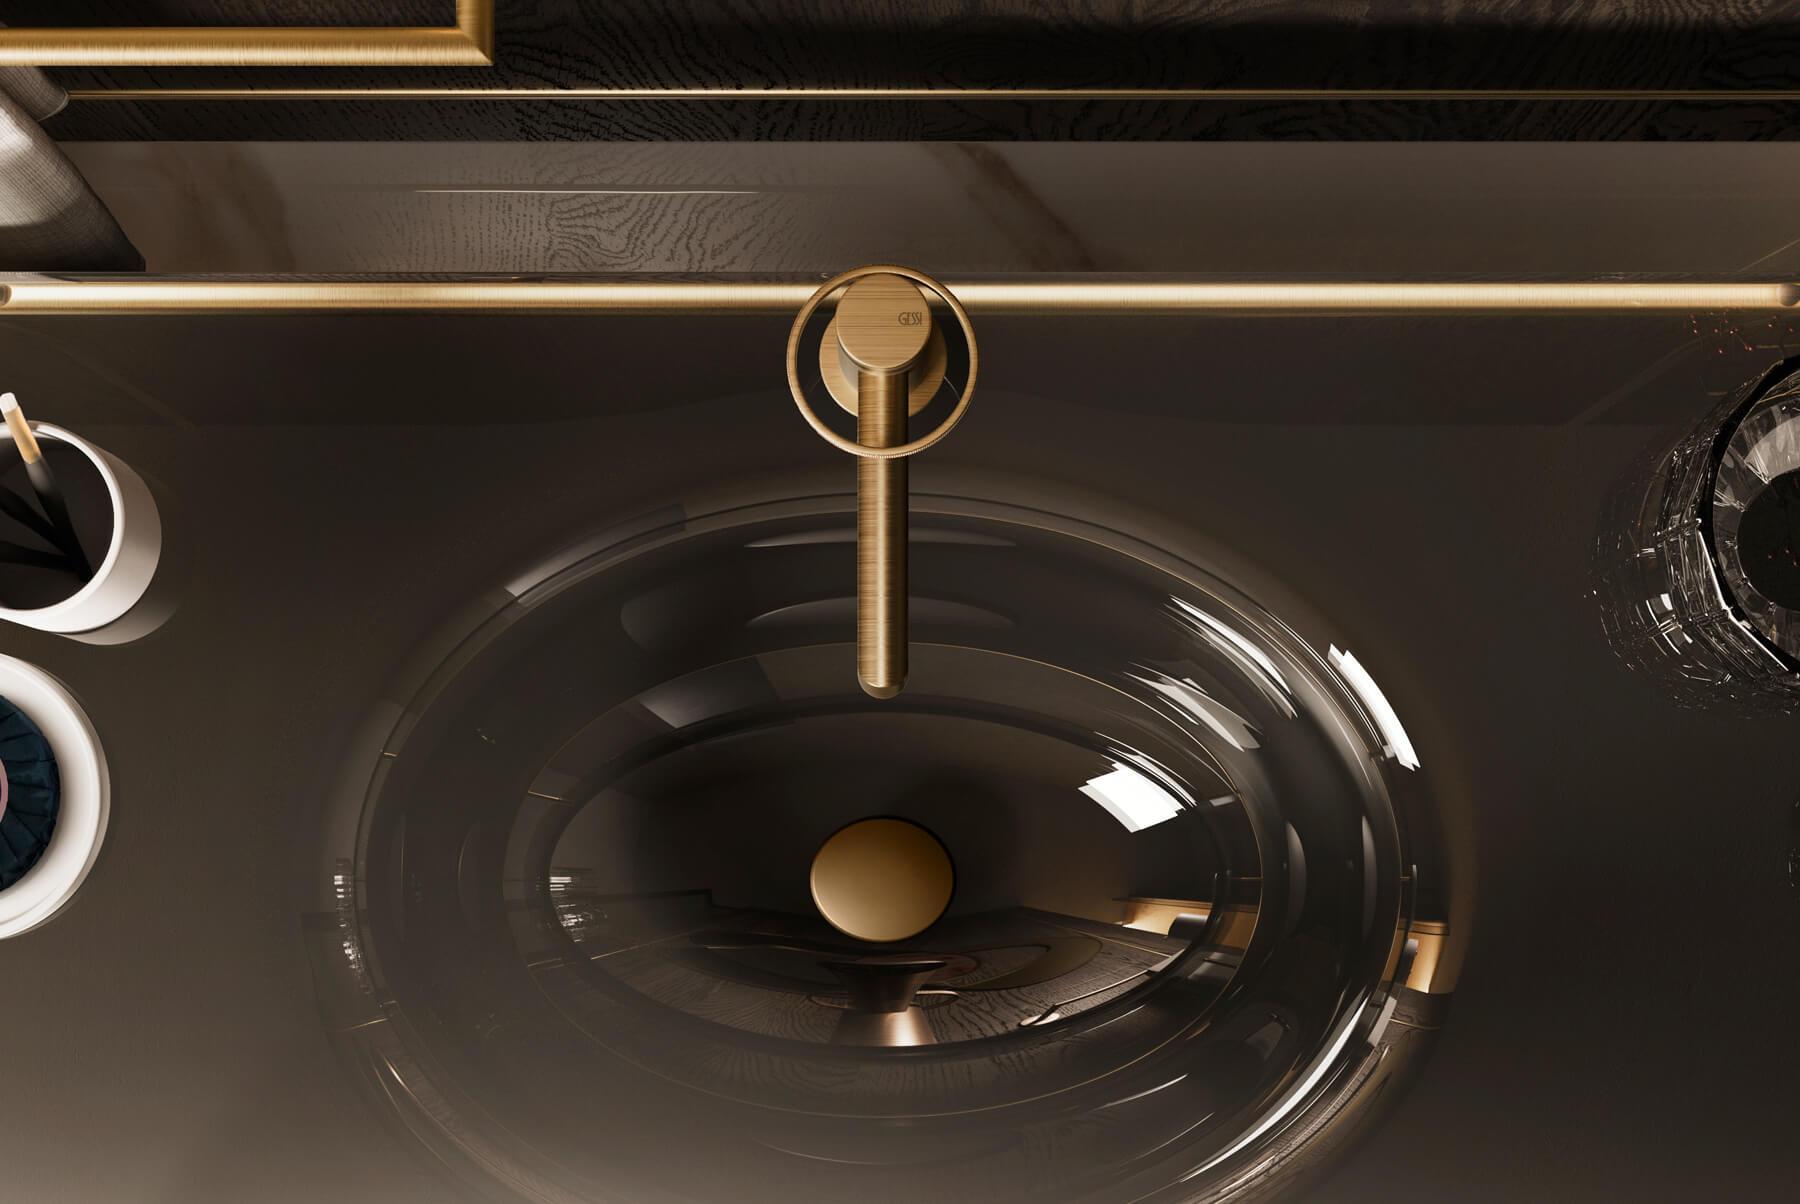 Brassware-GESSI-Anello-Inset-3-1800x1204